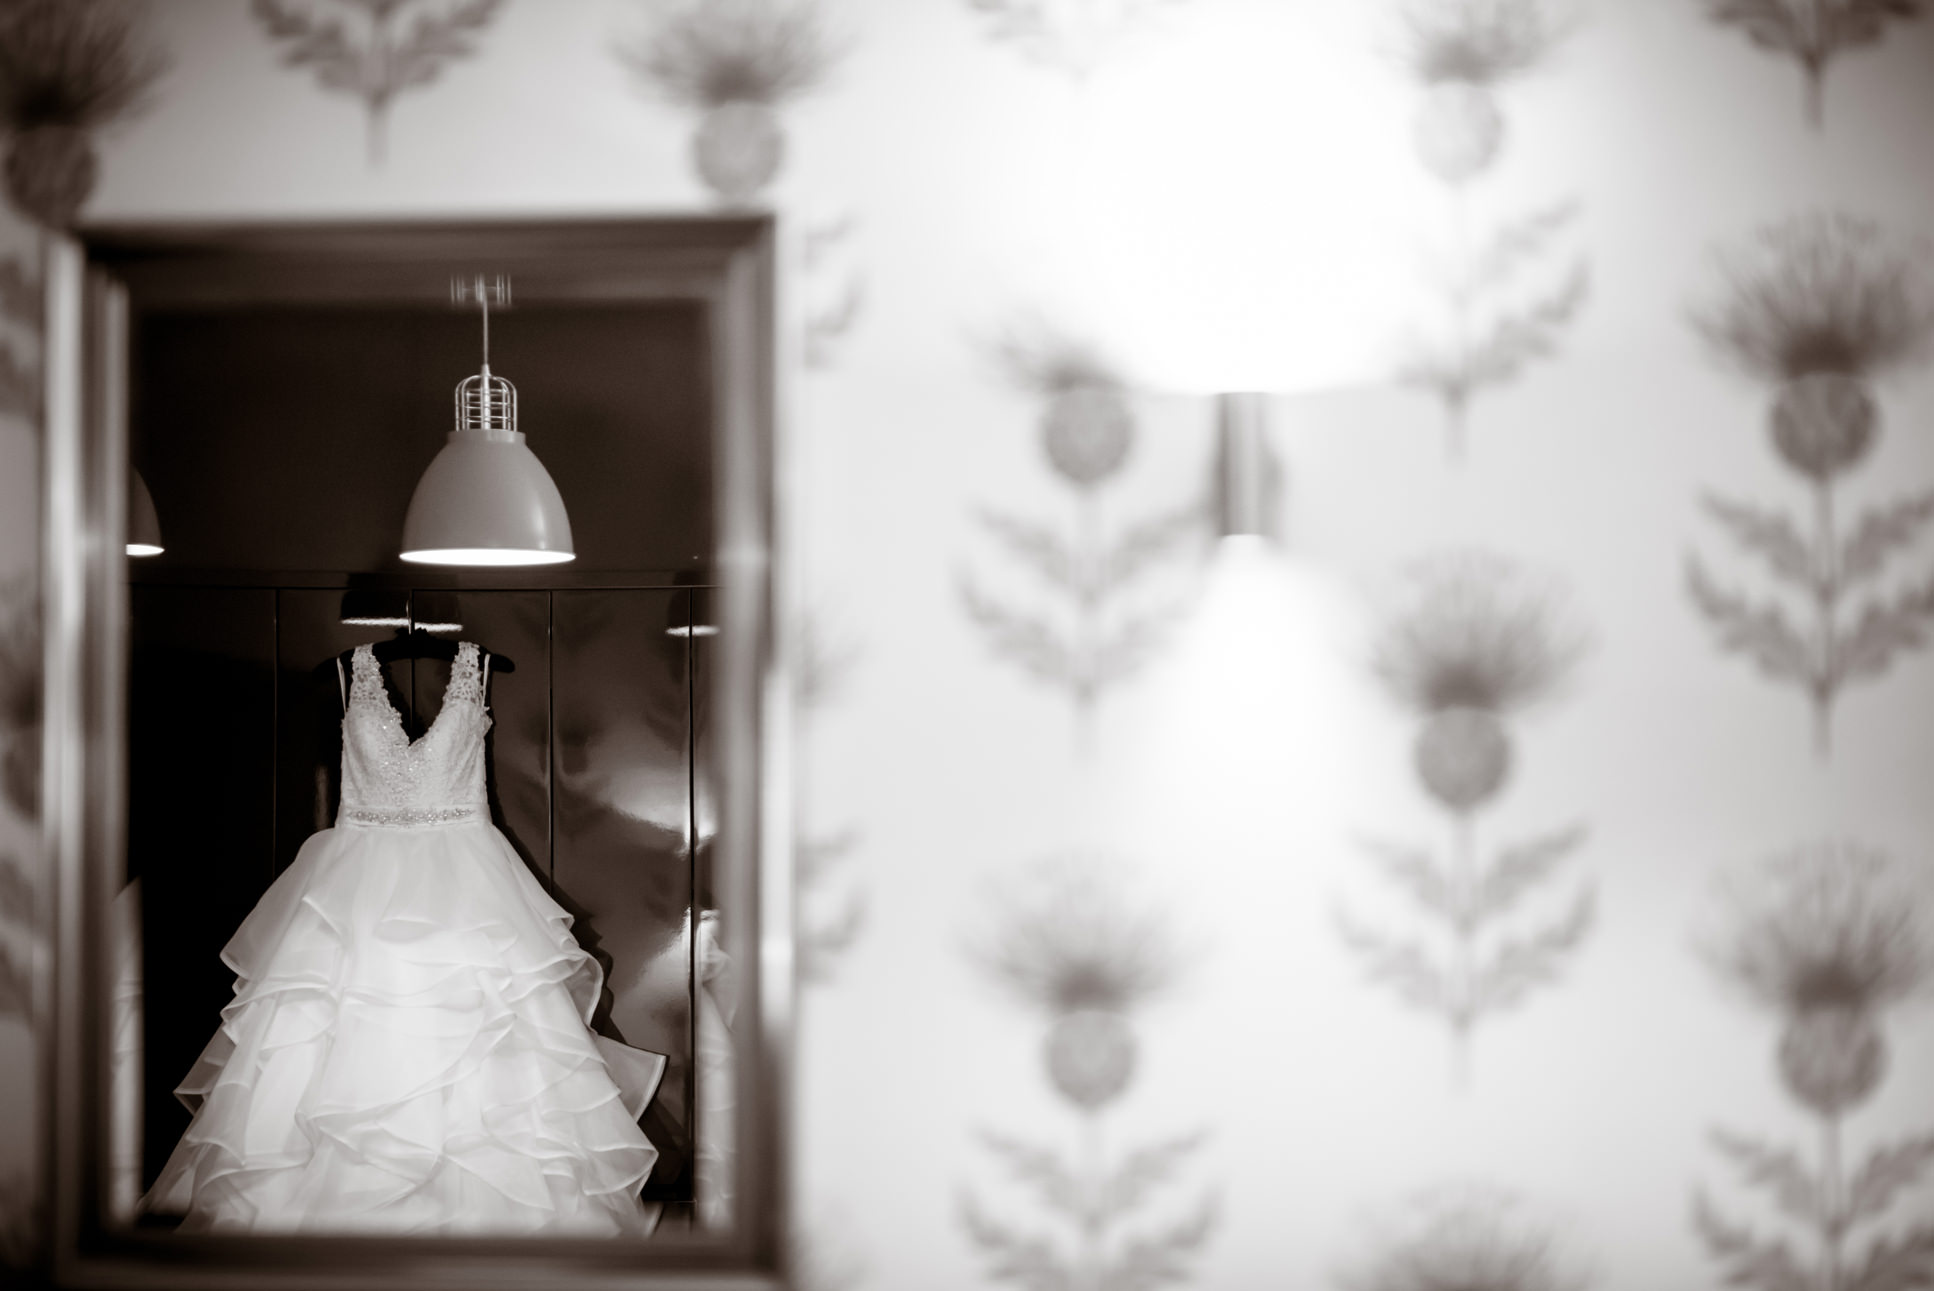 alternative-wedding-photography-cruin.jpg